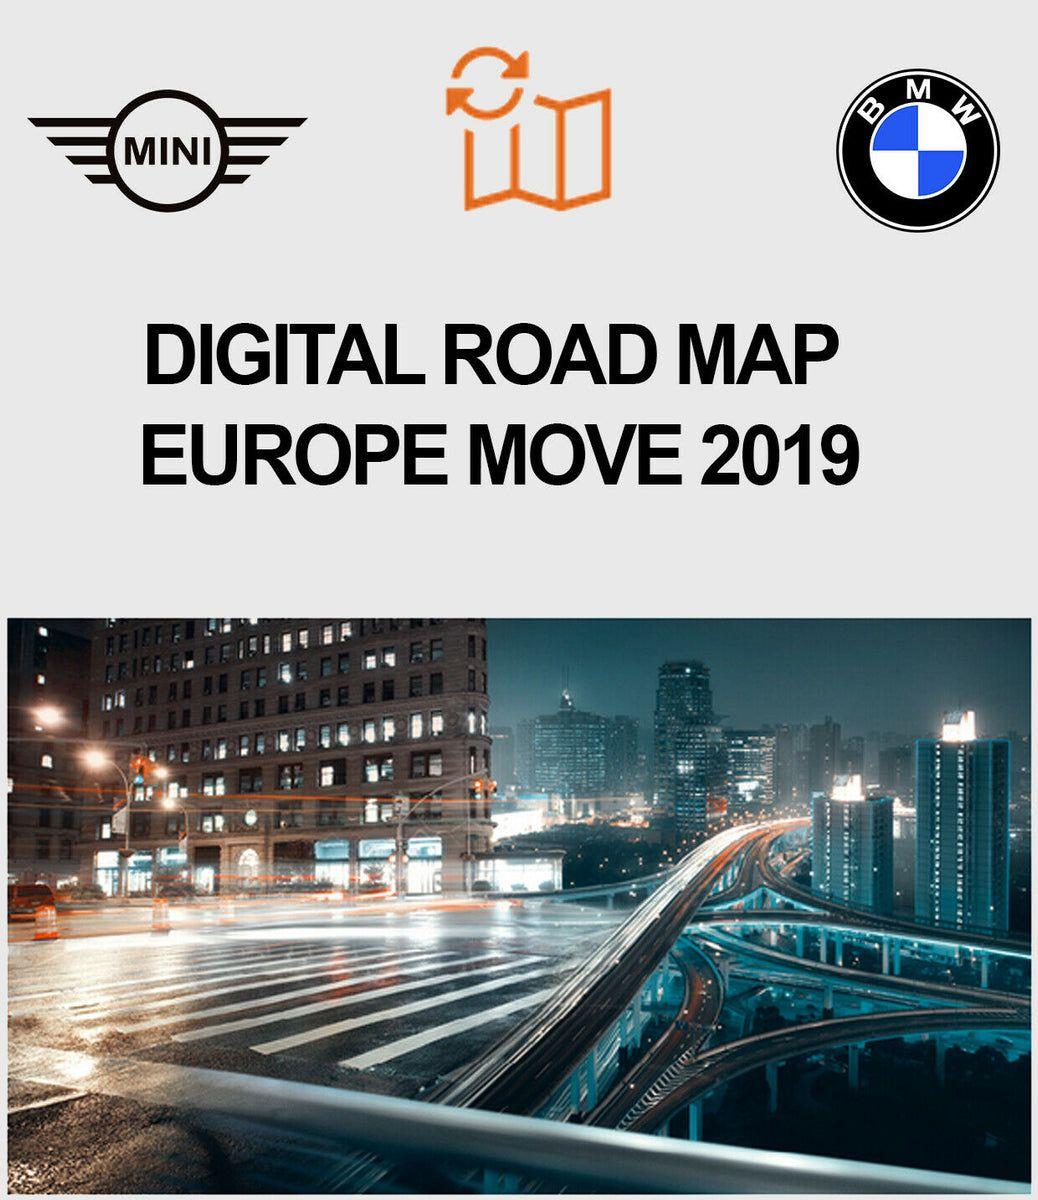 Road_Map_Europe_MOVE_2019_1200x1200.jpg